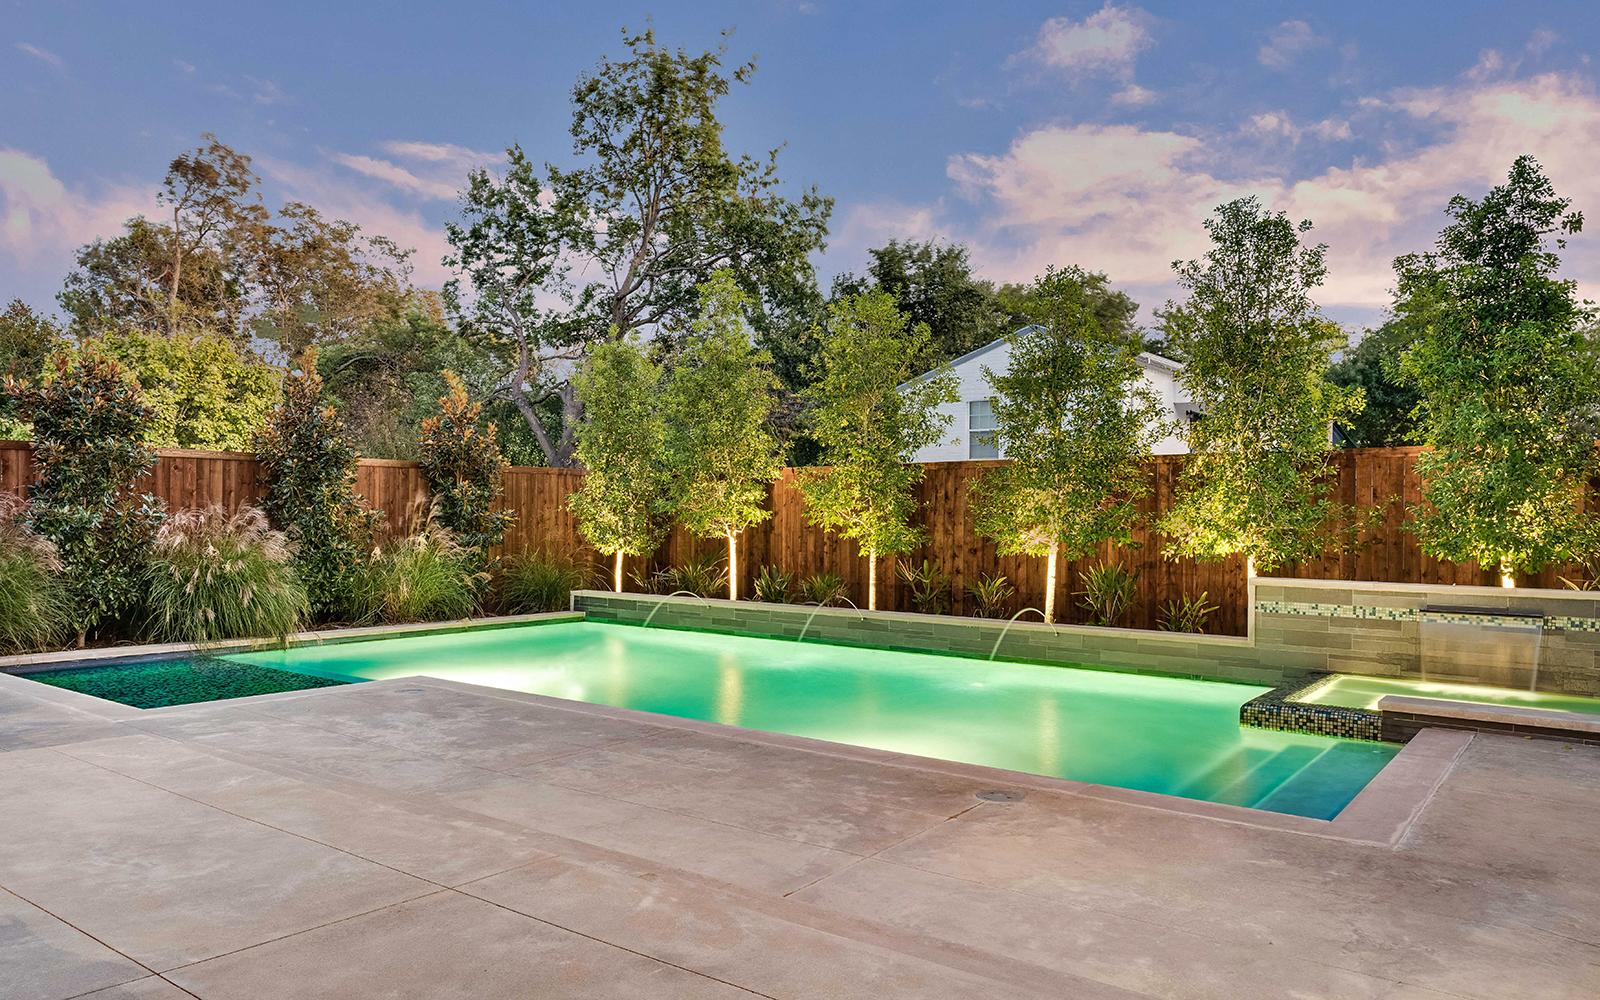 sunnyland-modern-pool-terrace-night-concrete.jpg